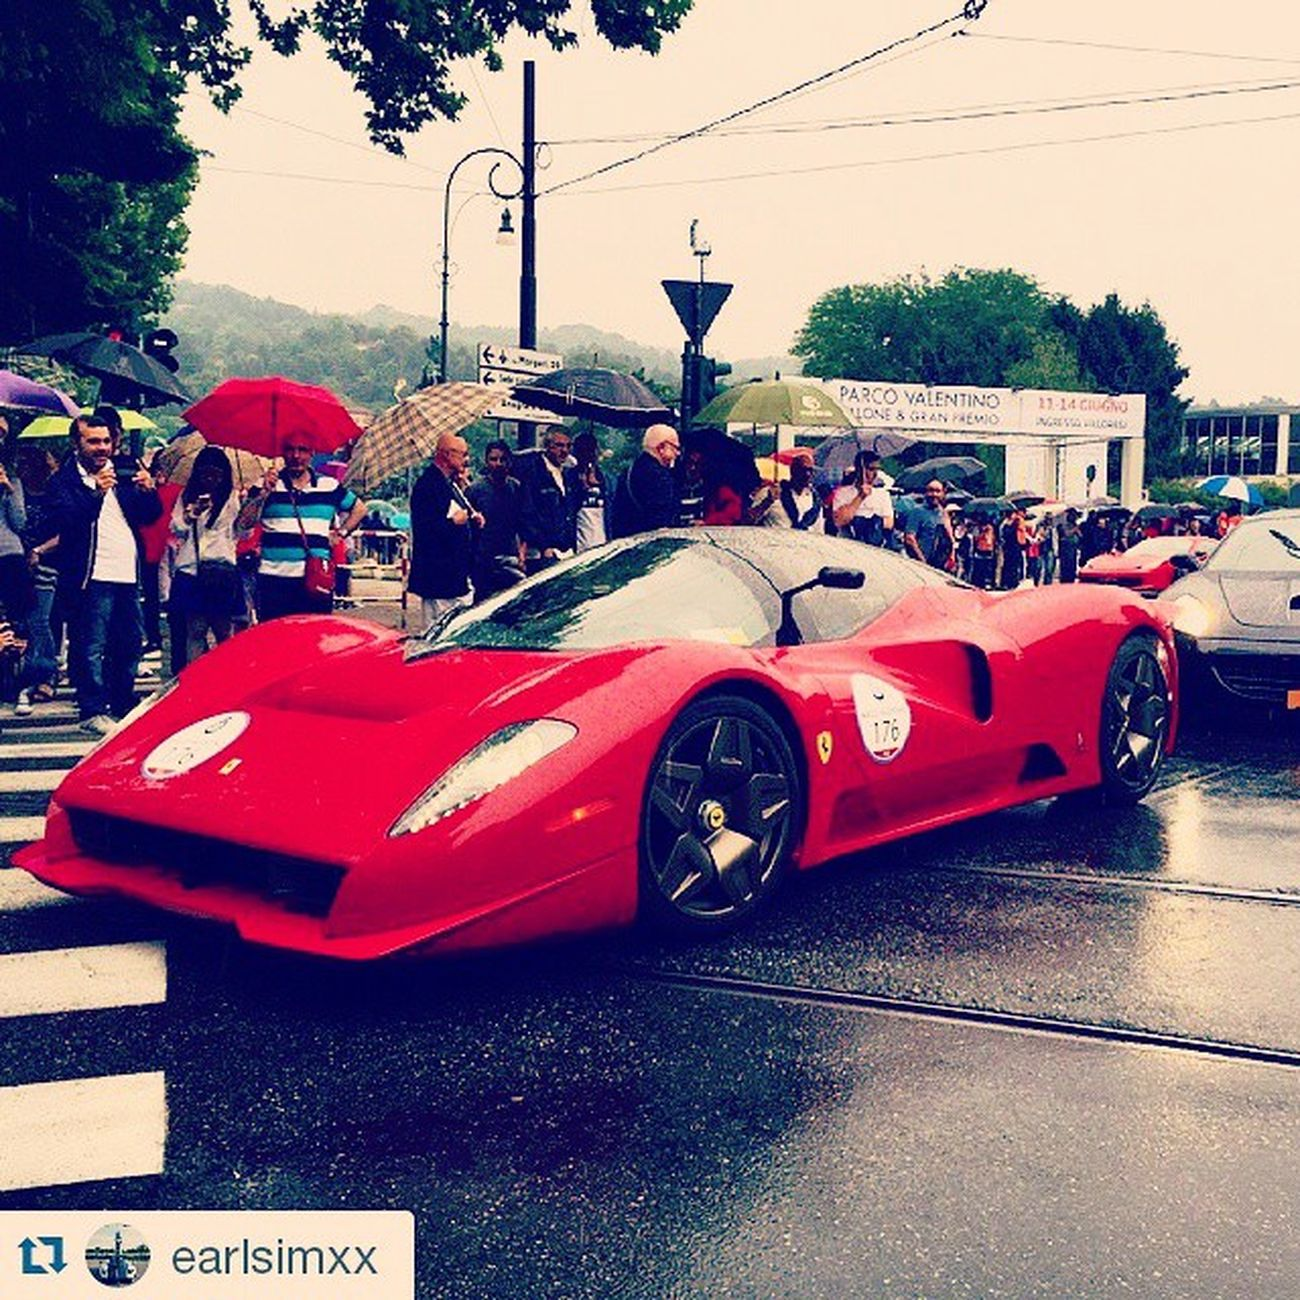 Repost @earlsimxx ・・・ Ferrari P4/5 by Pininfarina Parcovalentino GTspiritTour